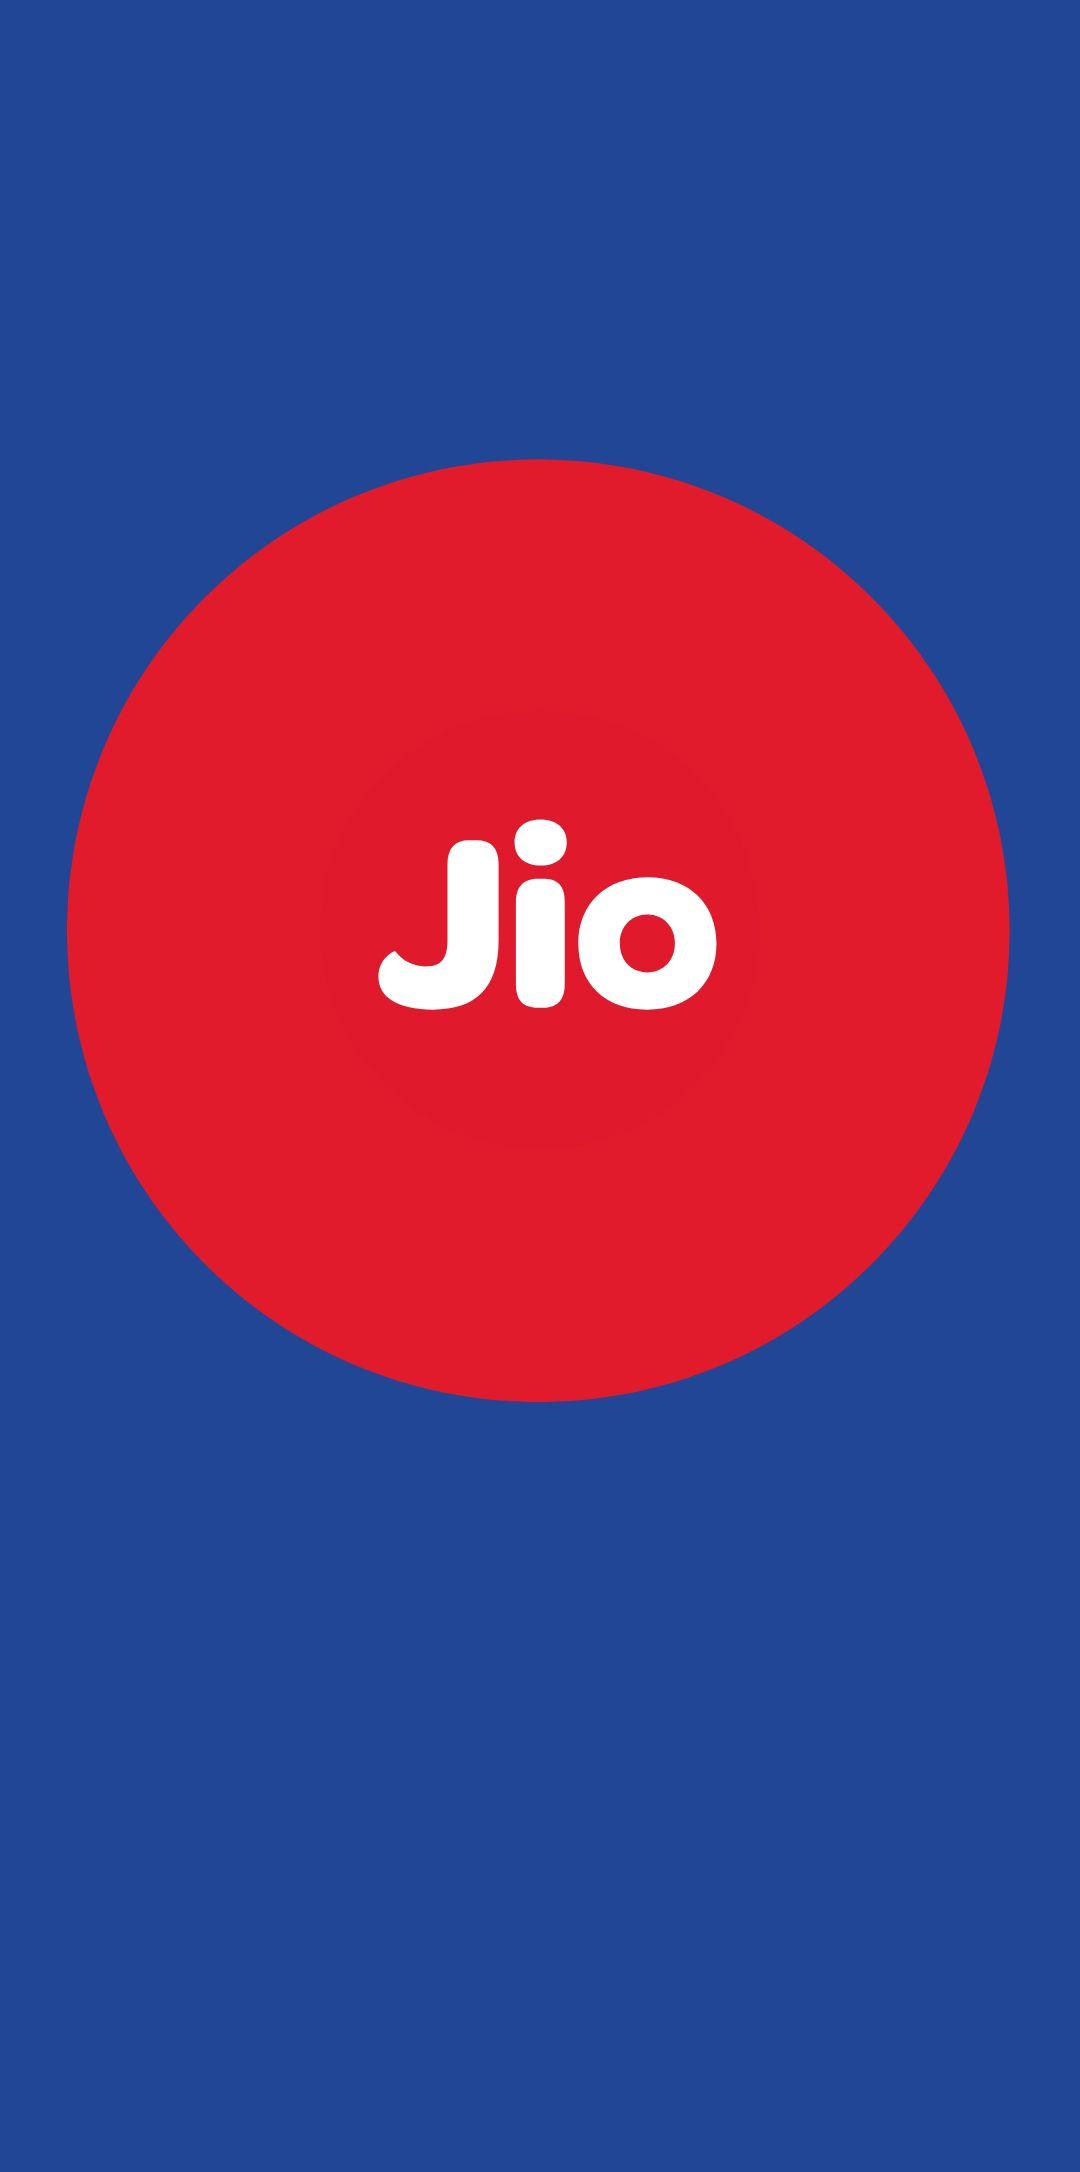 Jio Mobile Wallpaper Hd Android Wallpaper Galaxy Mobile Wallpaper Android Wallpaper